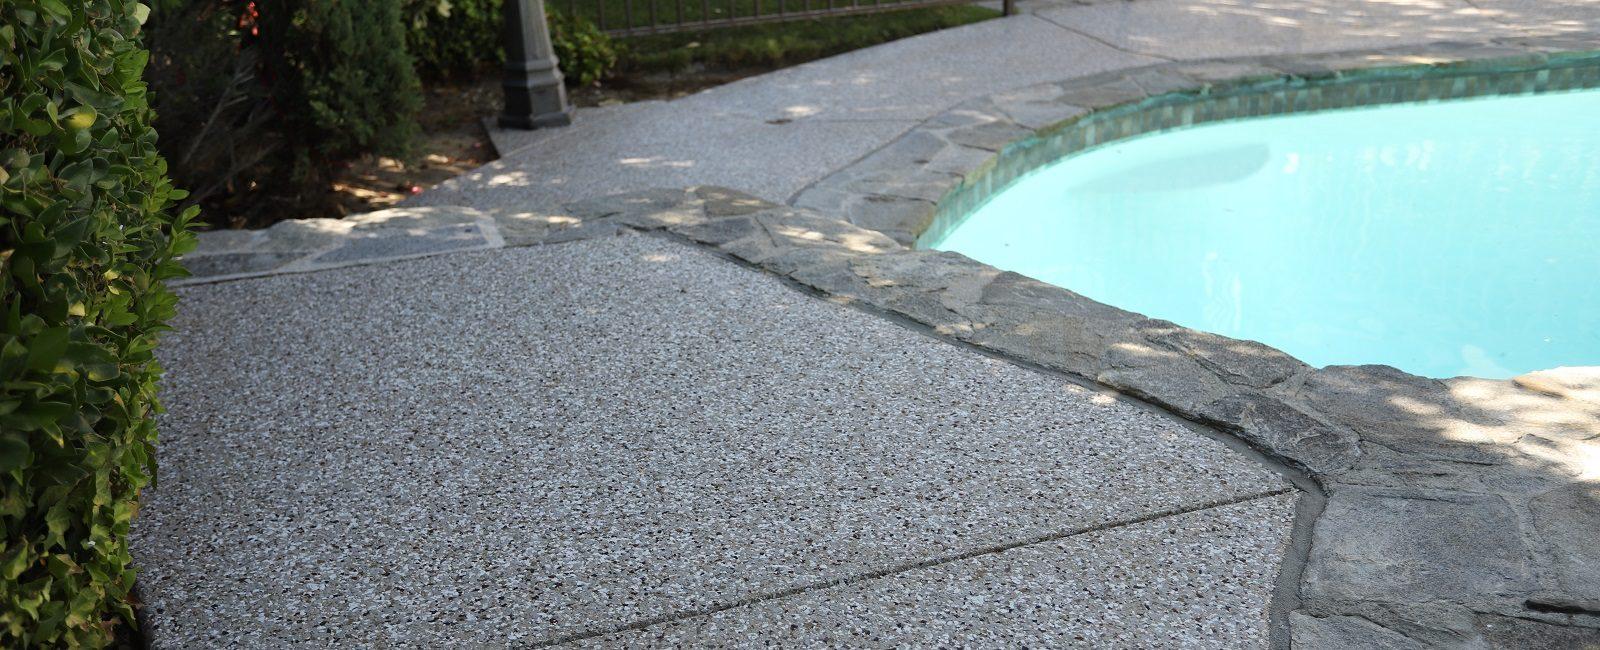 polyurea coated pool deck in santa clarita valley